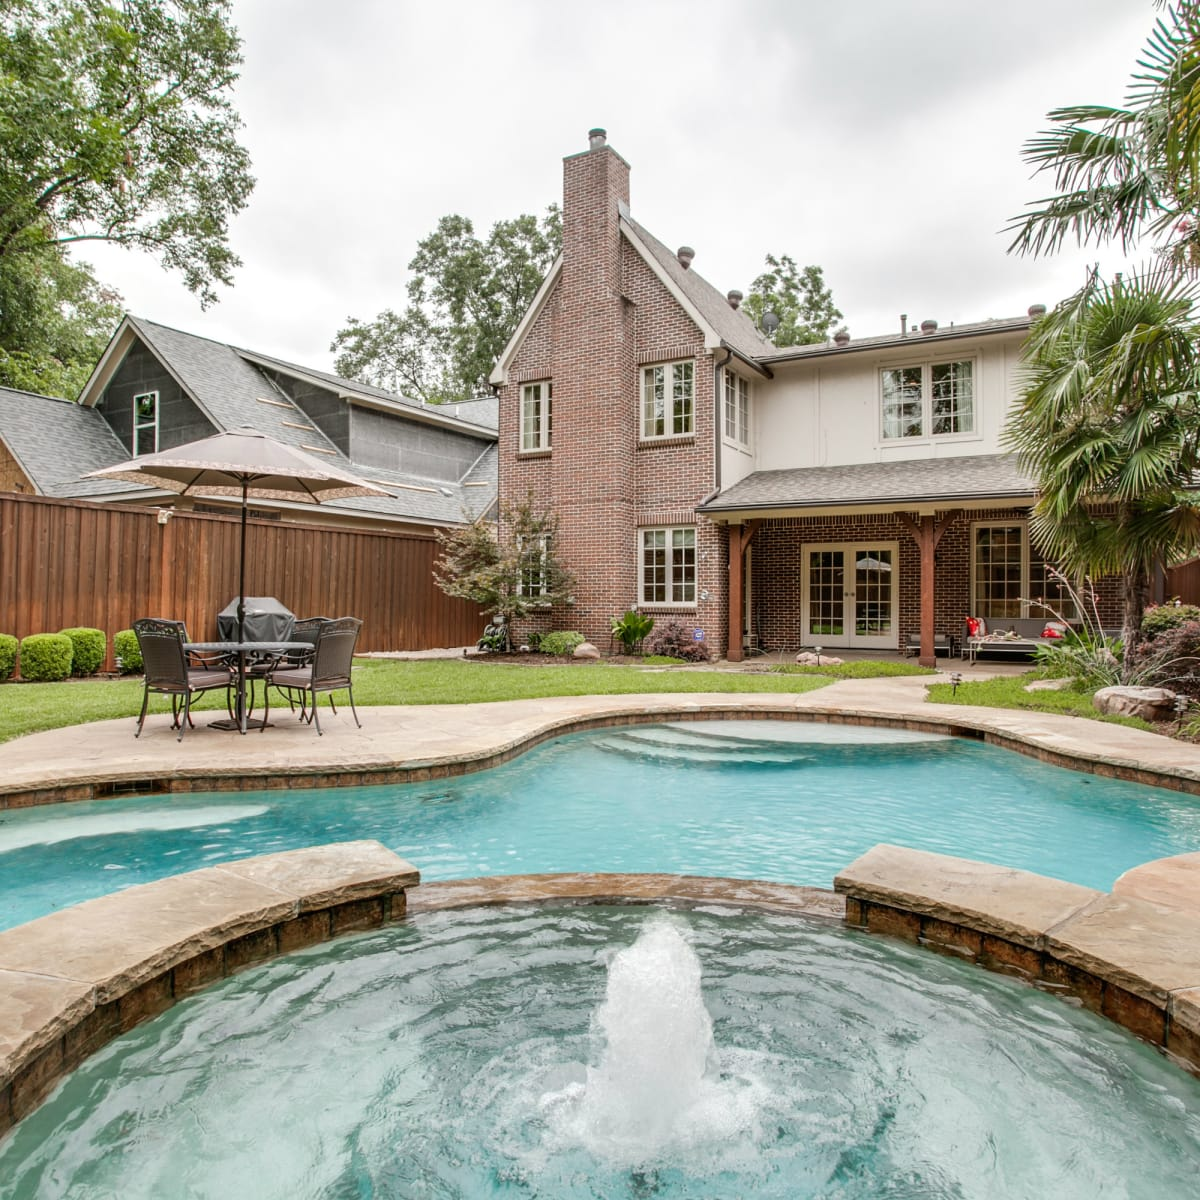 Backyard of 5723 Mercedes Ave. in Dallas